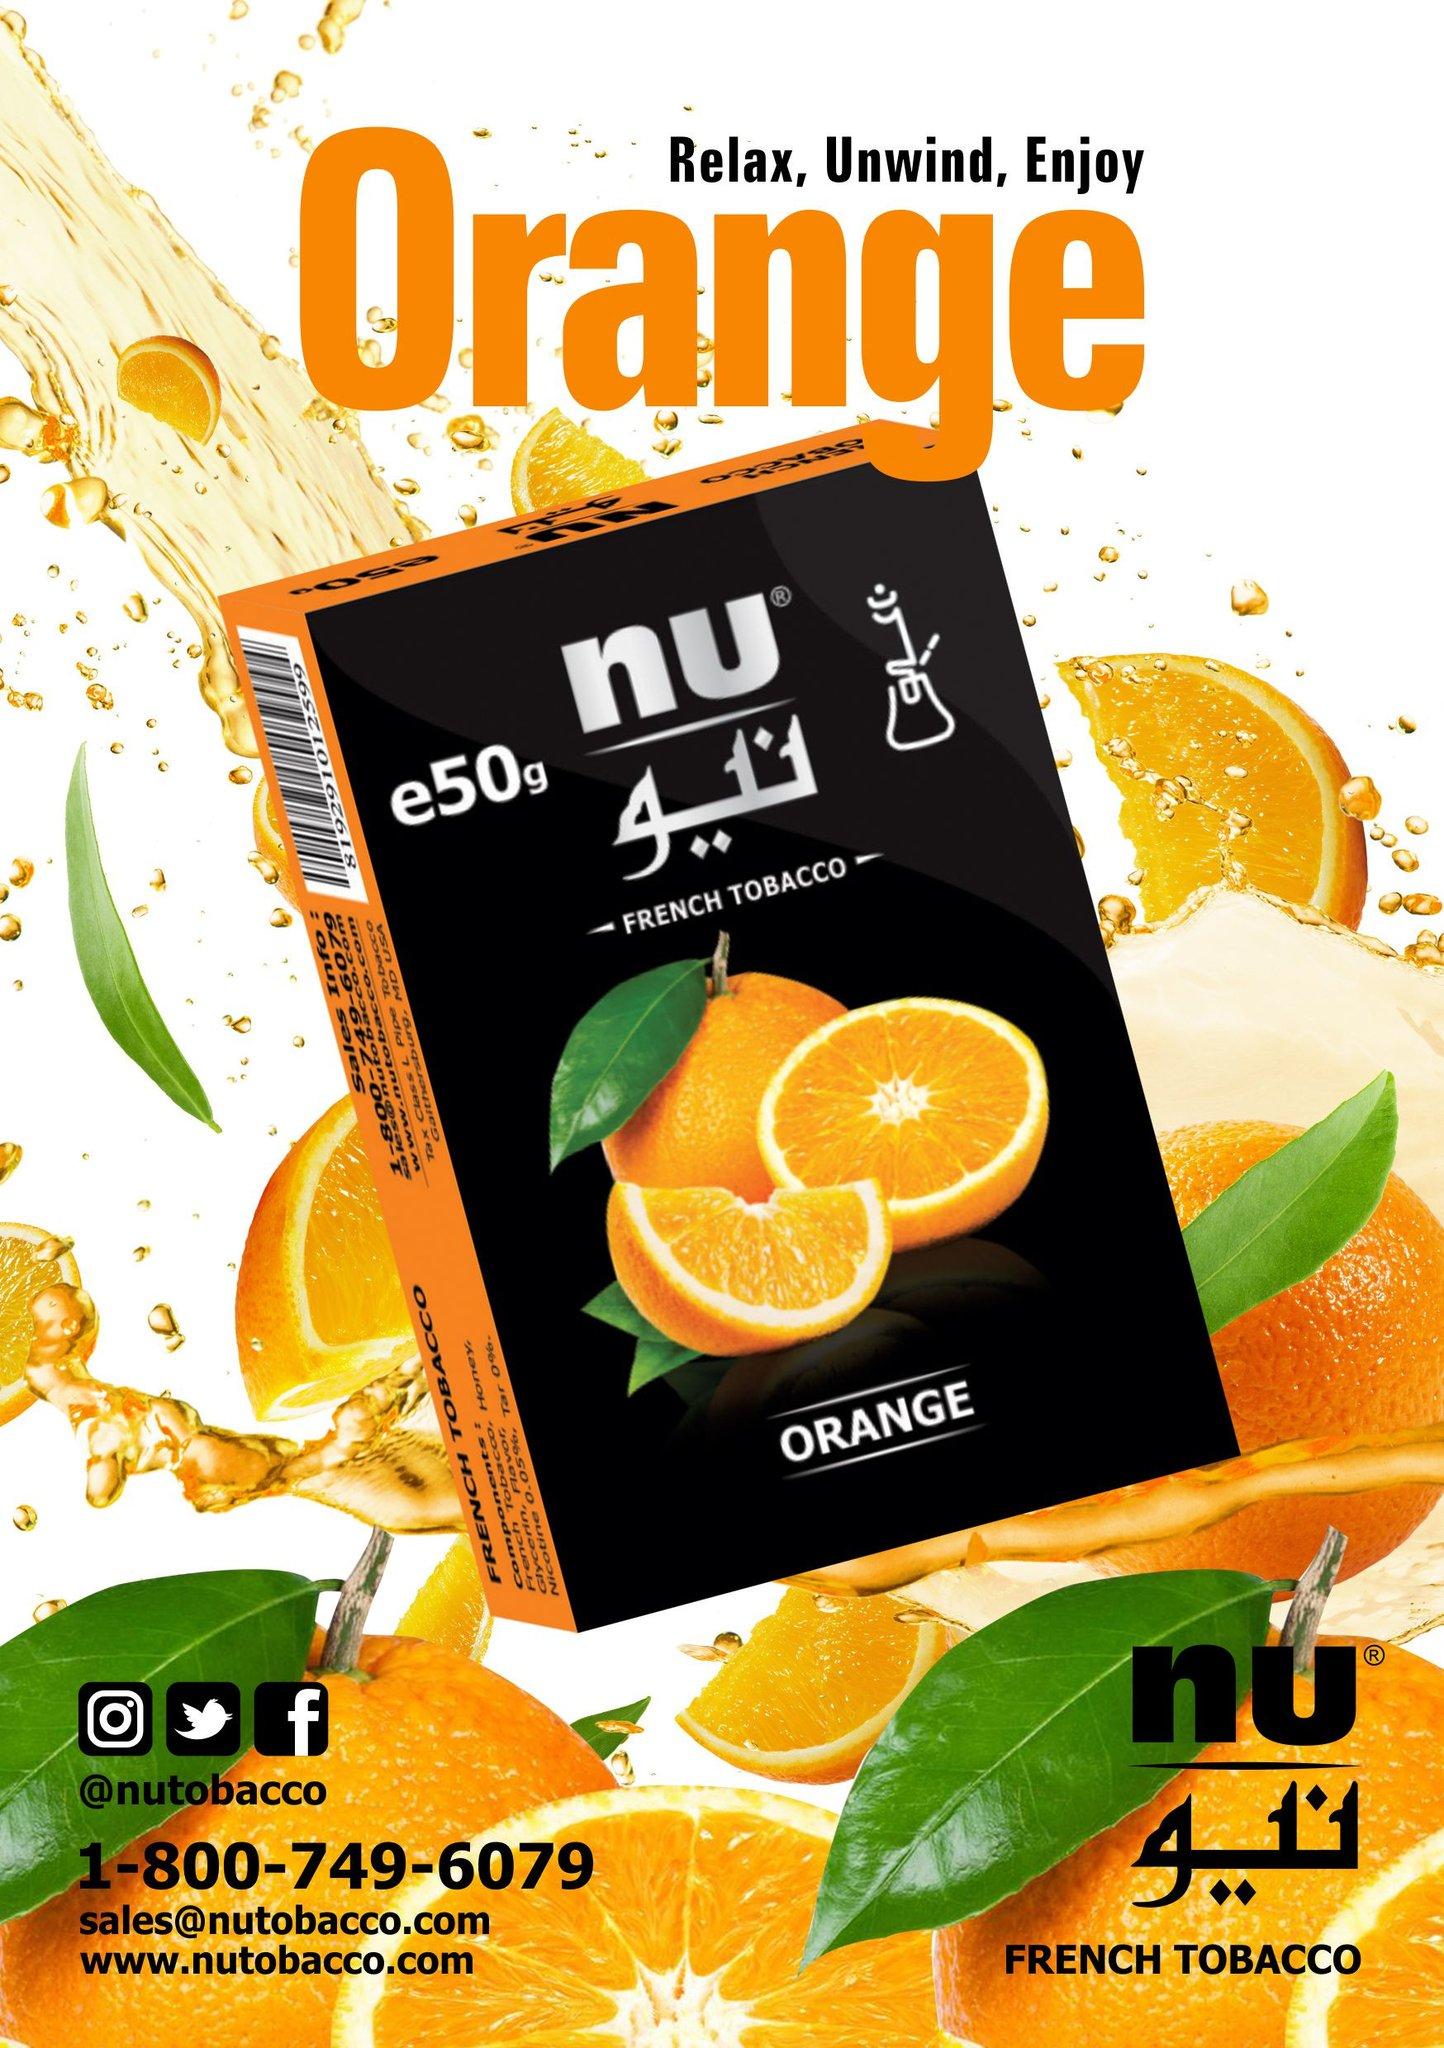 Nu Hookah / Orange(やや甘めのOrange系、中東の会社に見かける1つの典型)